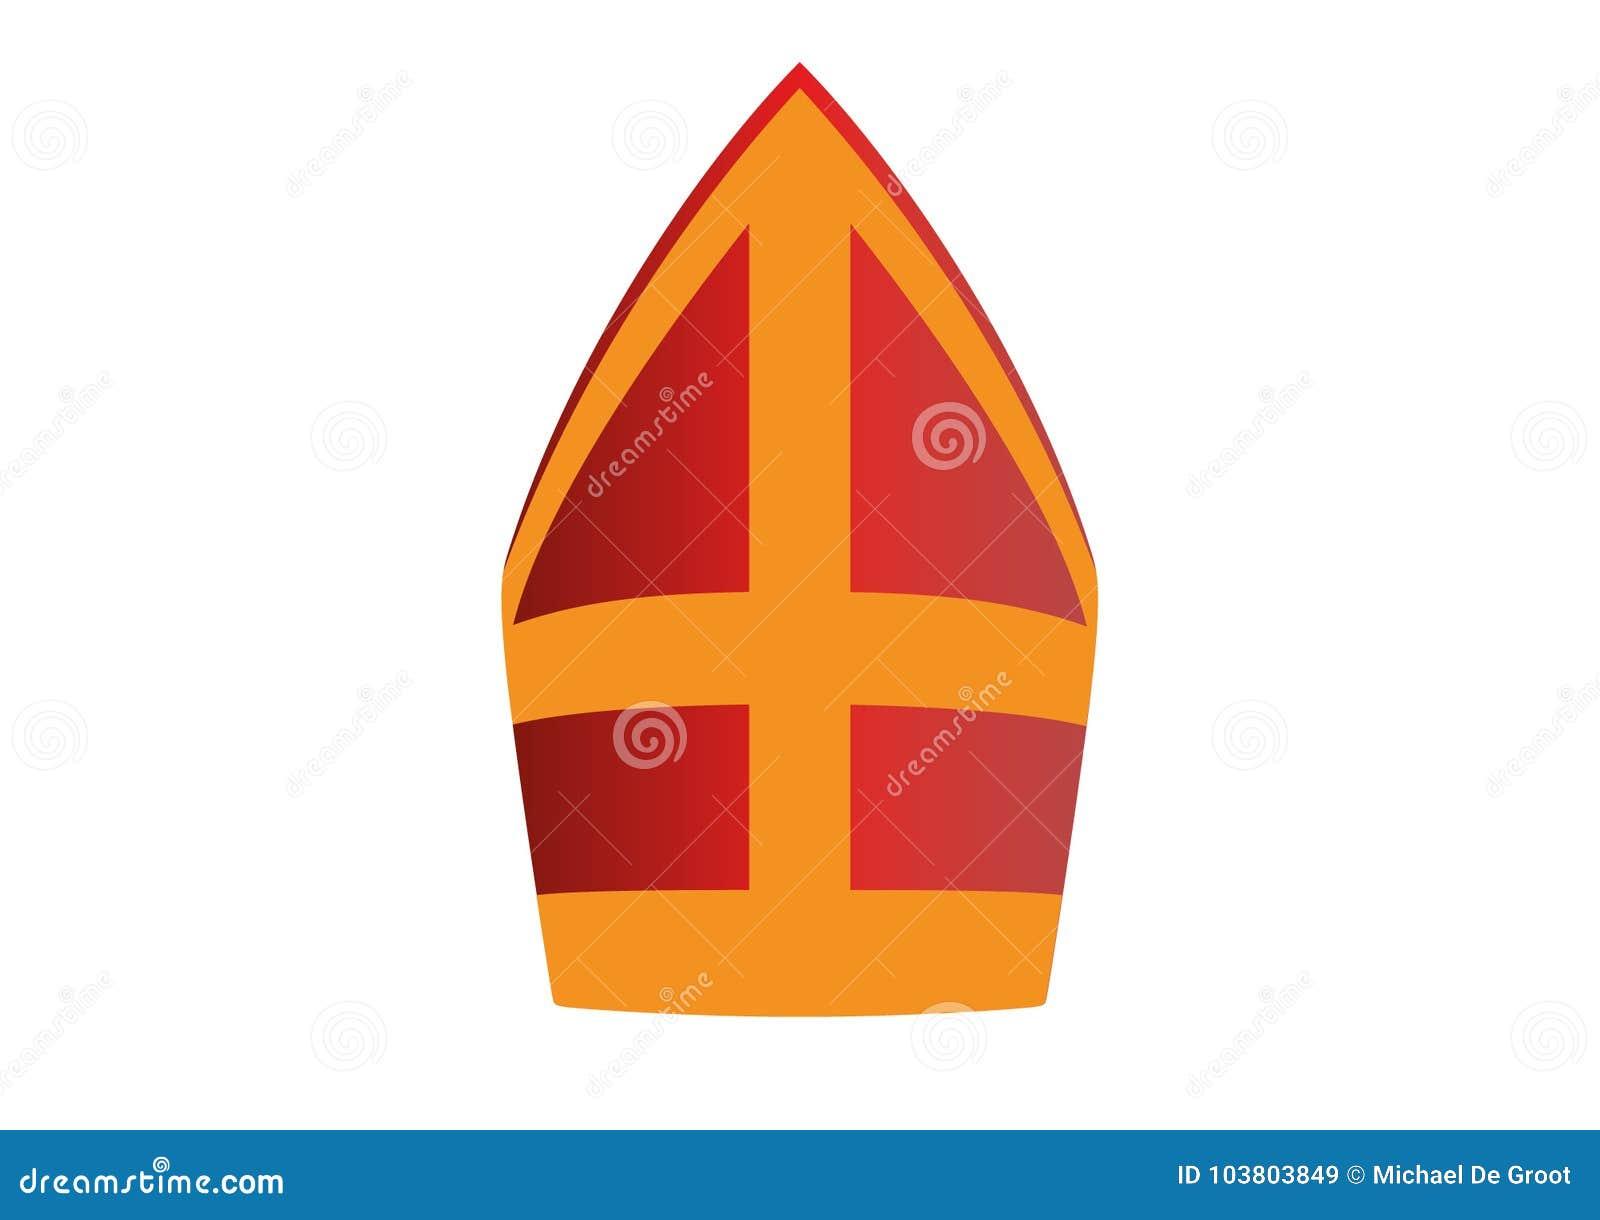 691d4ed84fc23 Sinterklaas Hat Illustration Red With Yellow Cross. Stock Vector ...